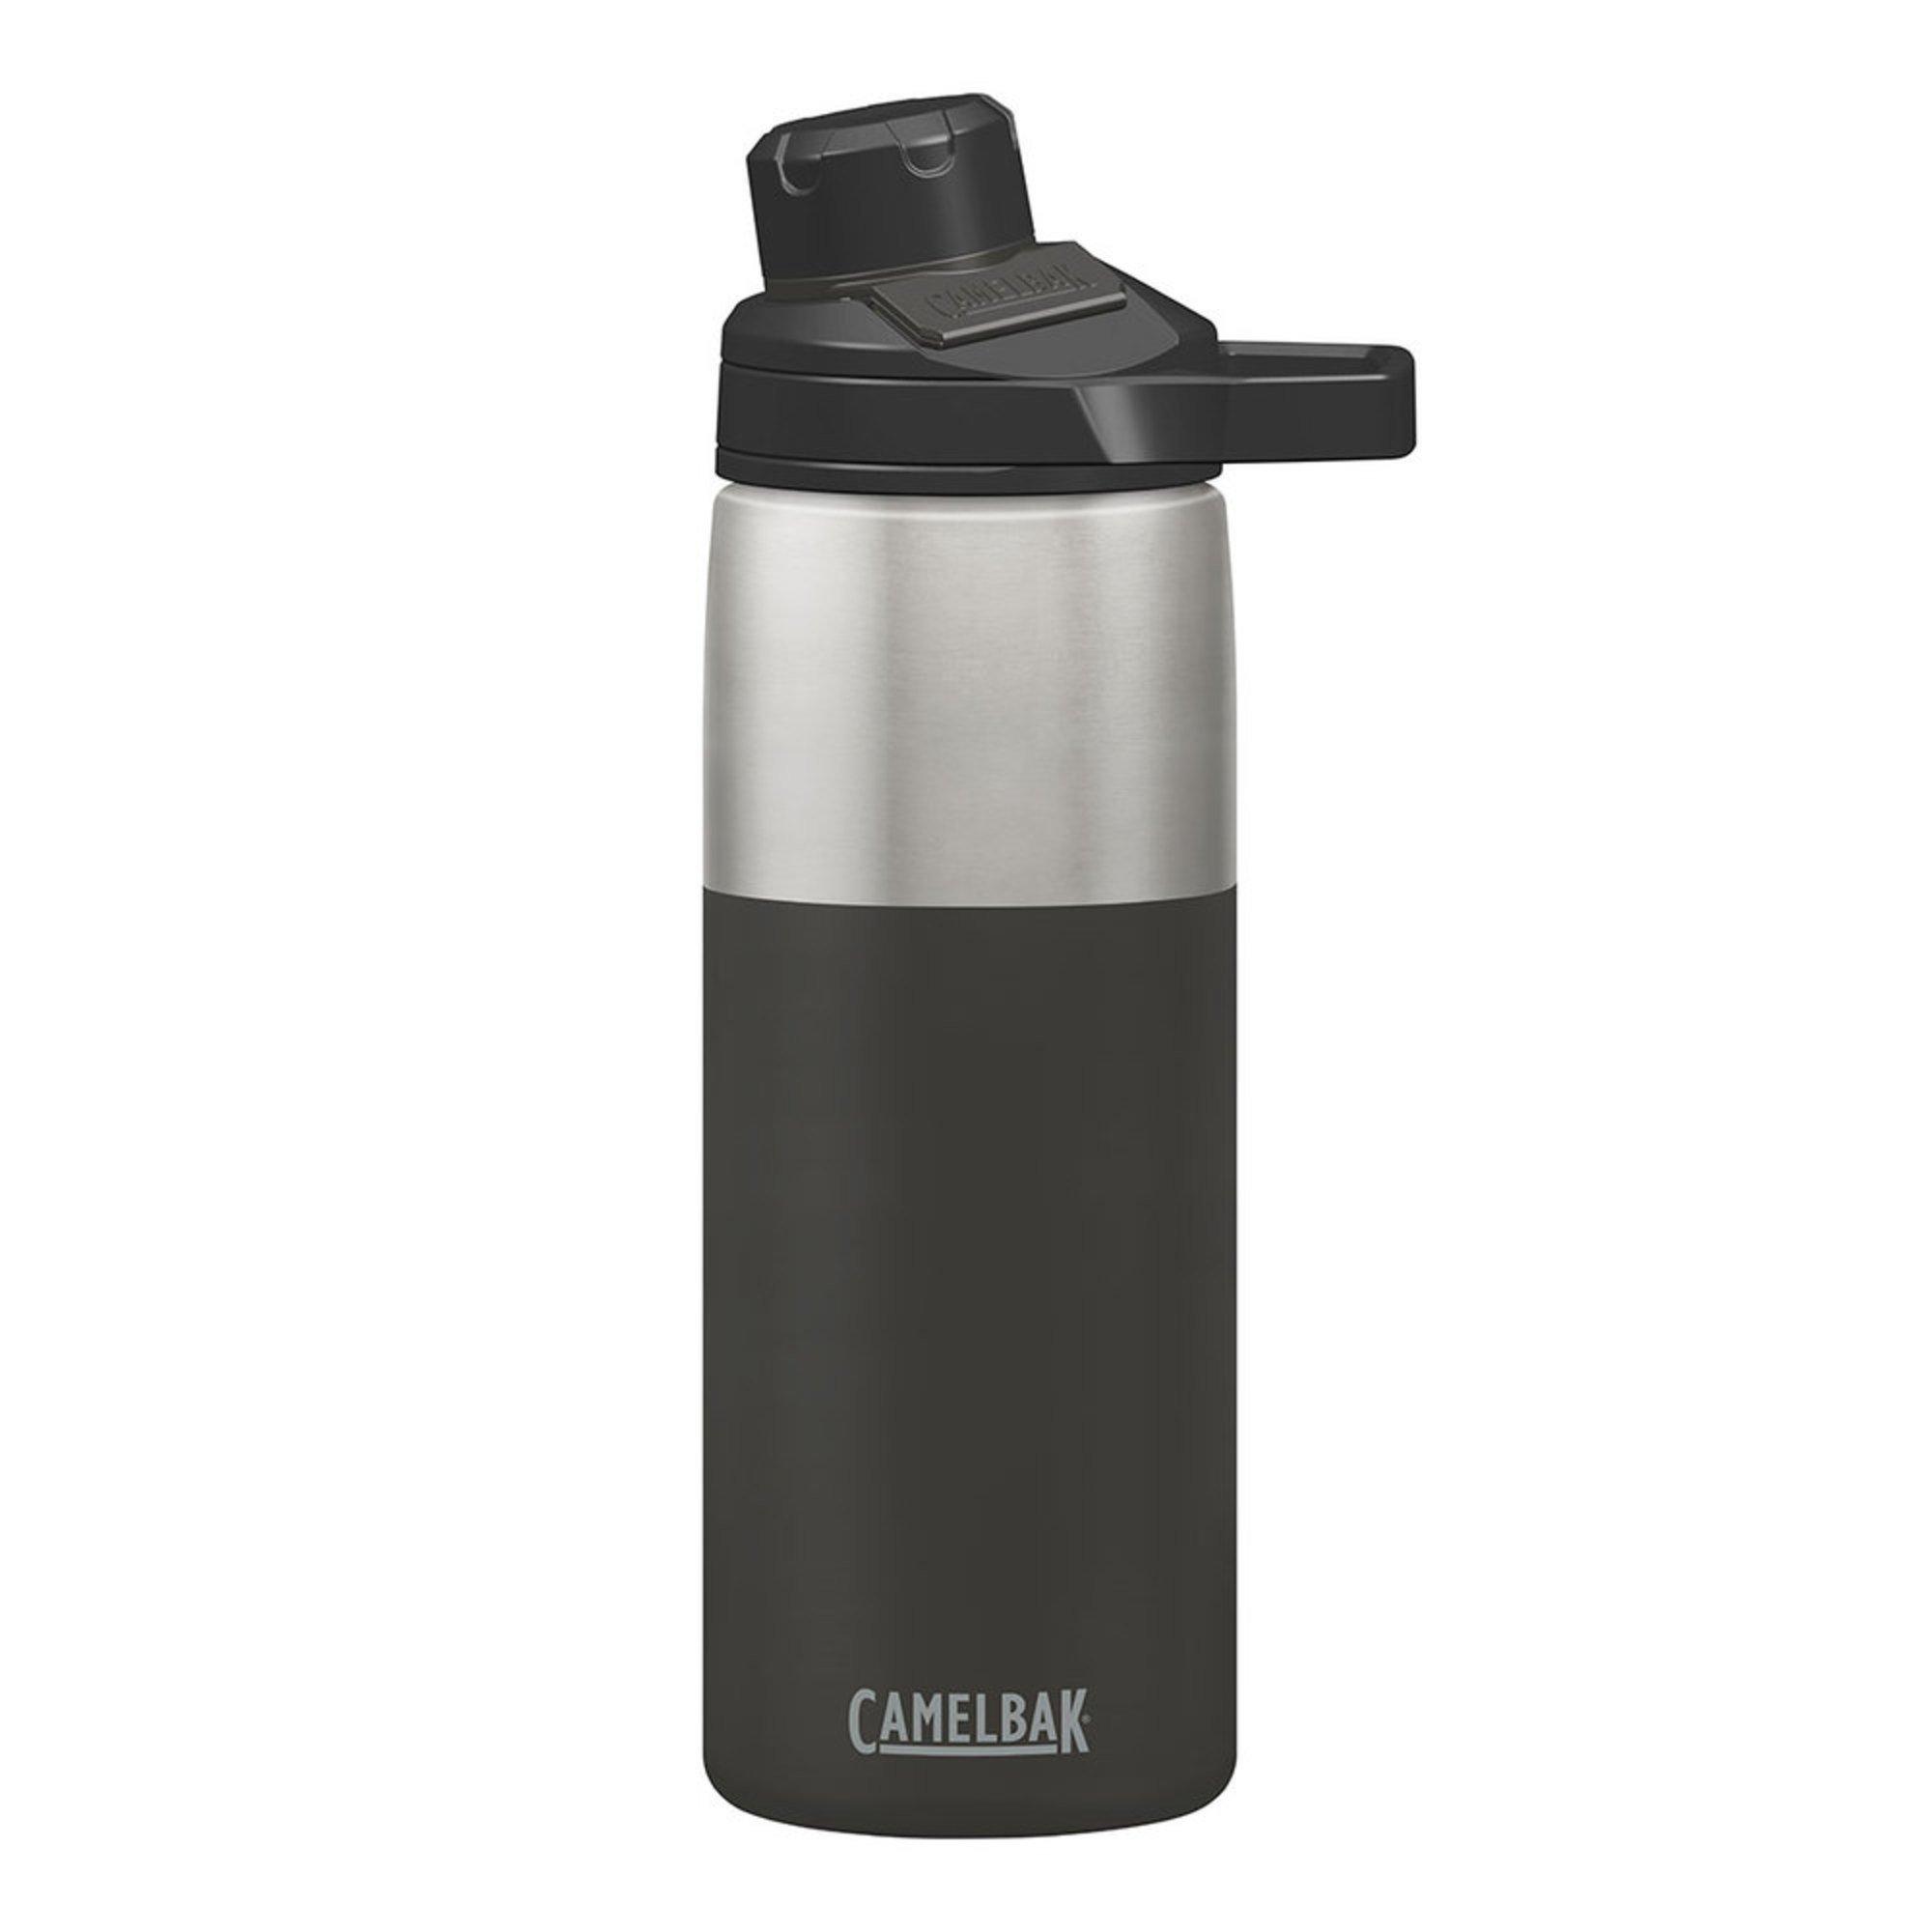 7d8b02b685 Camelbak 20 Oz Chute Mag Vacuum Insulated Stainless Water Bottle ...